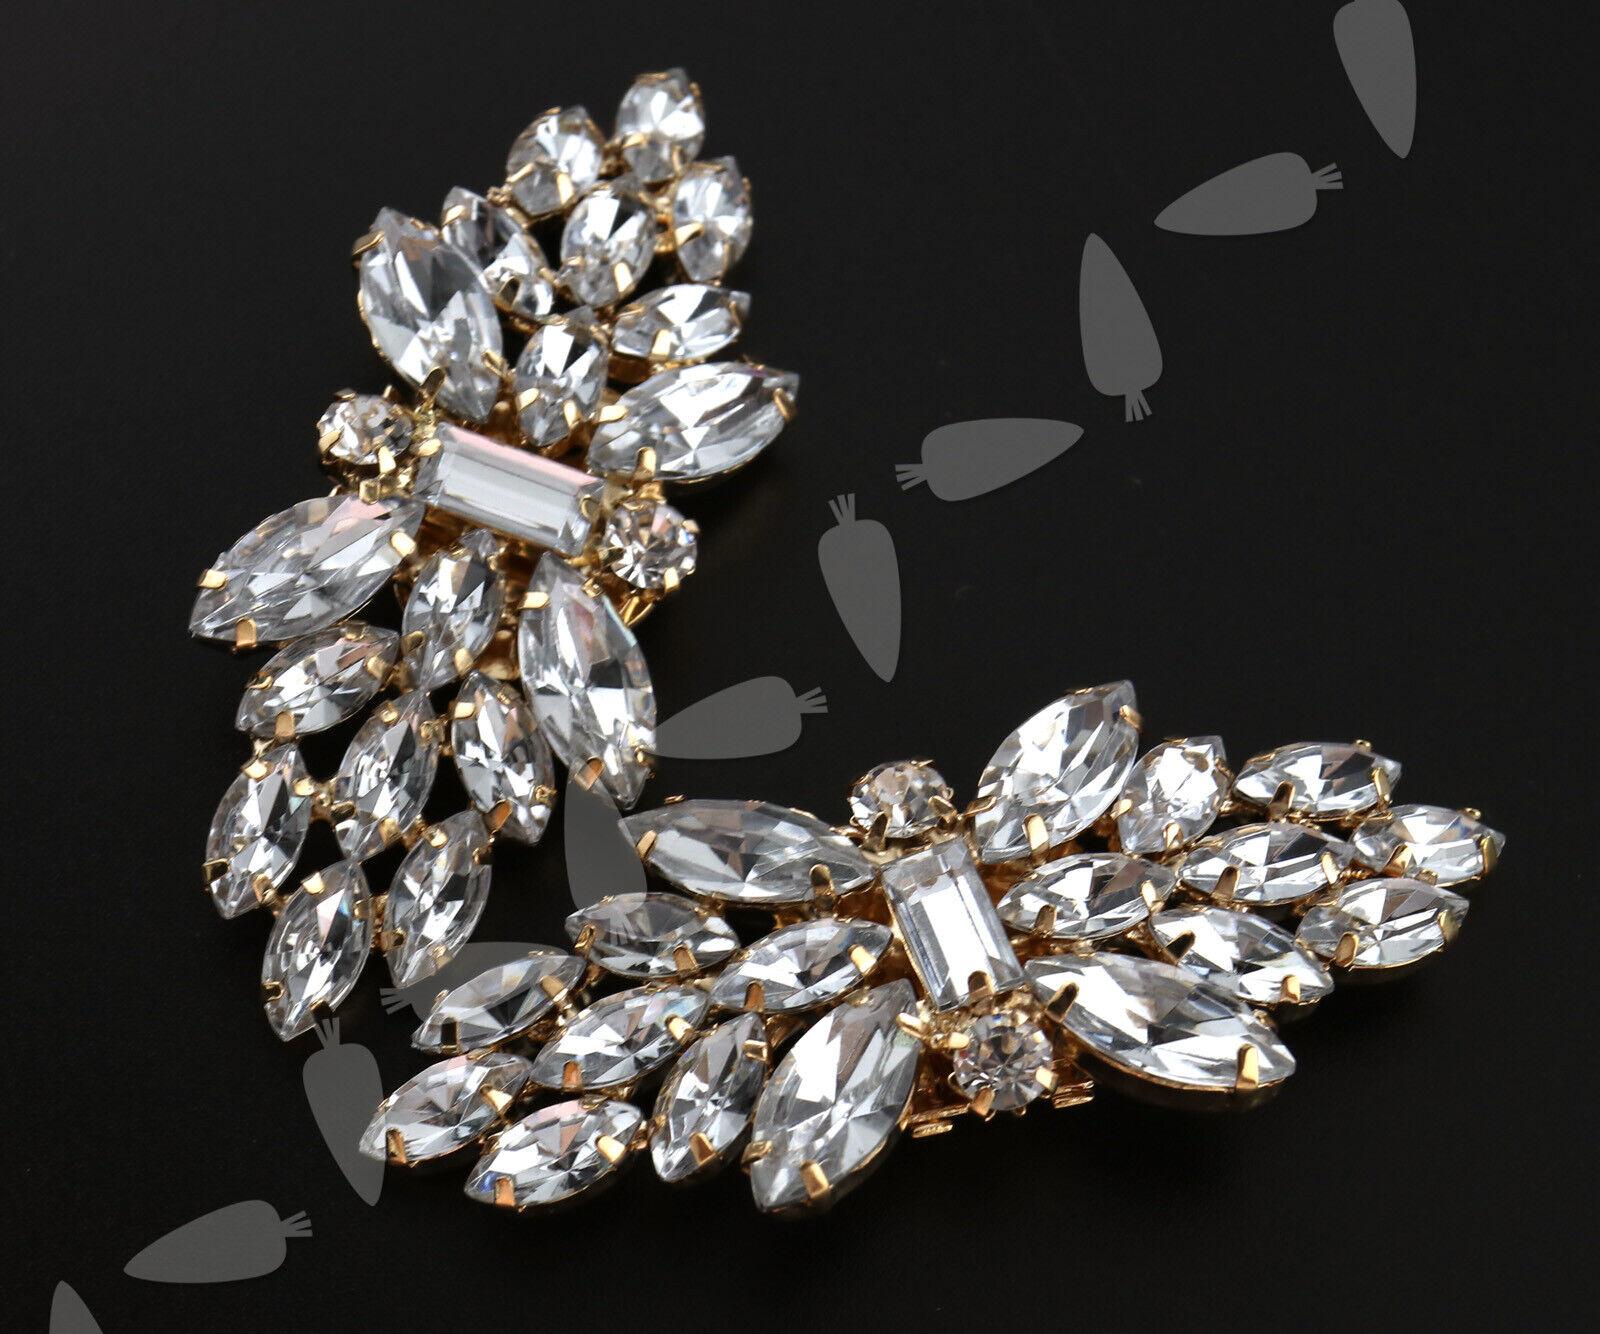 Crystal Rhinestone Shoe Clips Bridal Wedding Party Shoe Accessory Flower Design